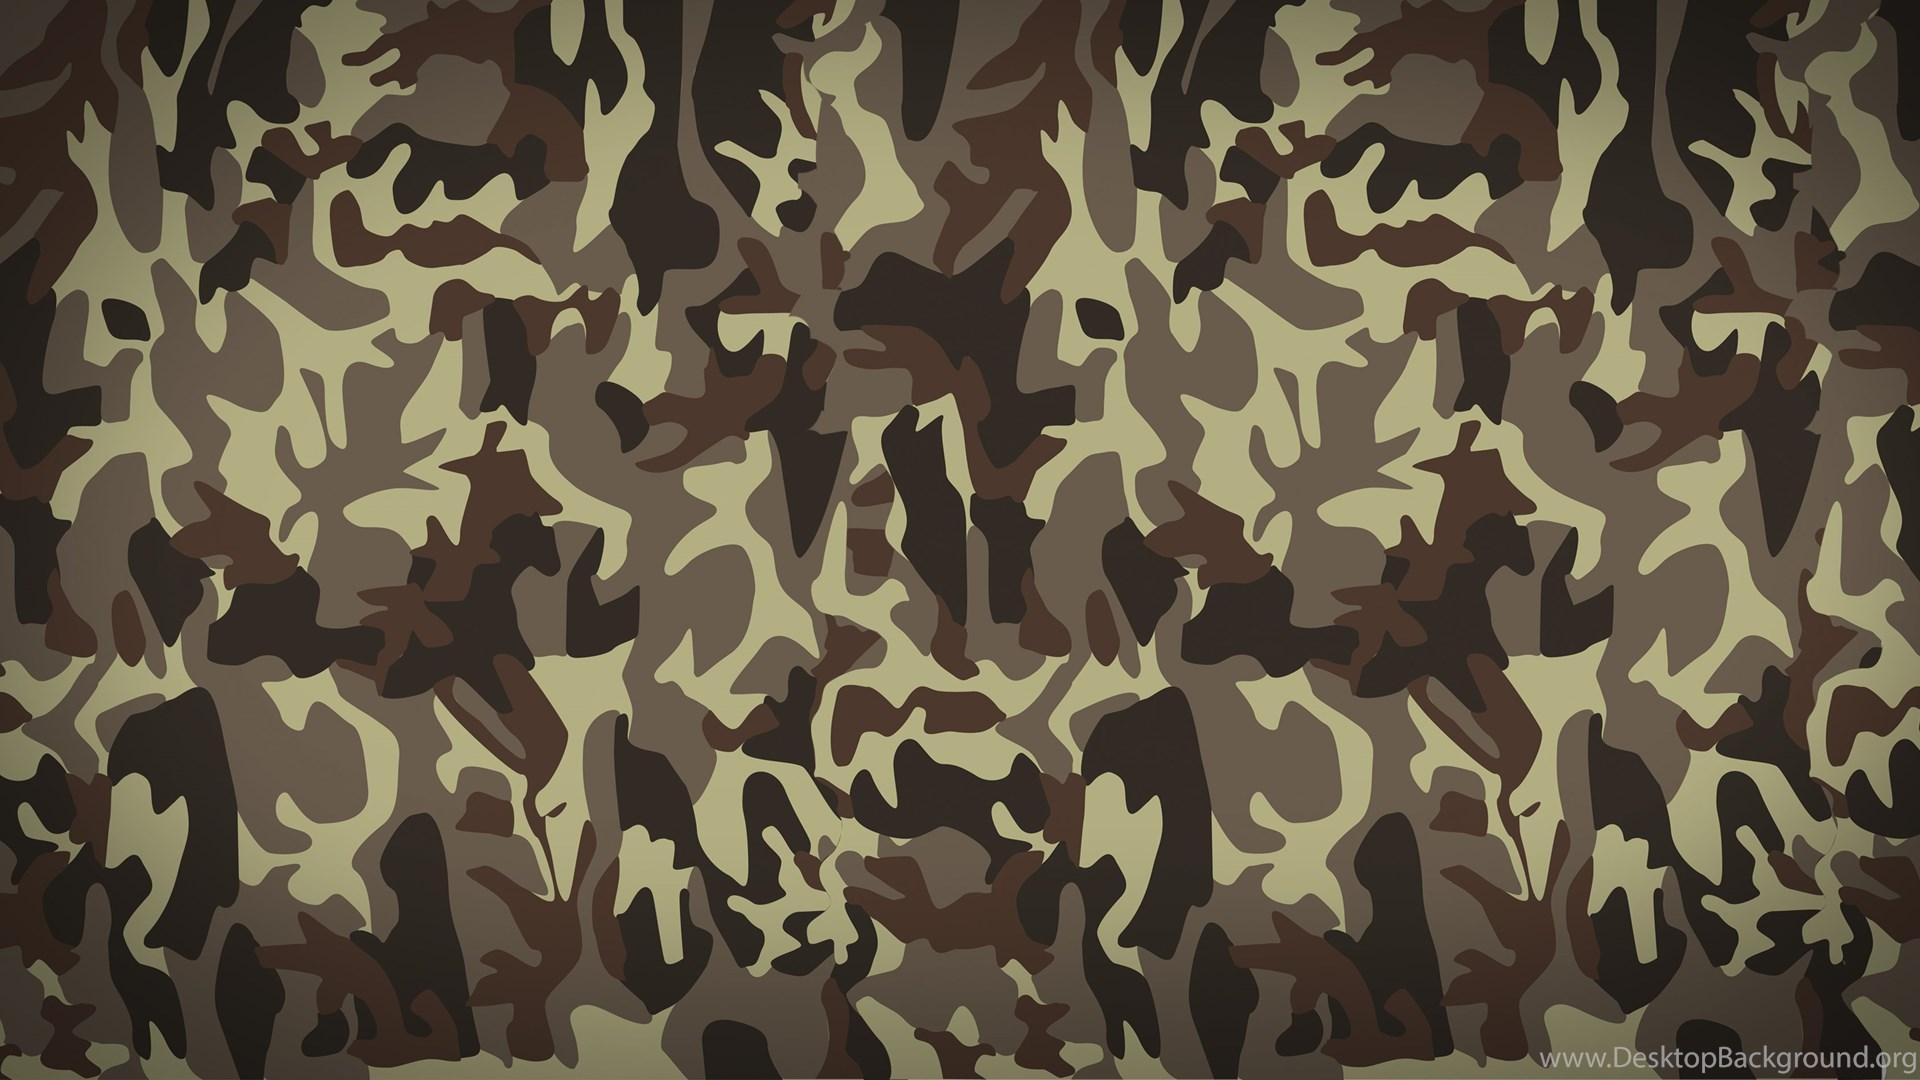 wallpapers 4k army military texture textures camouflage green hd background desktop khaki screen dual androidguys desktopbackground